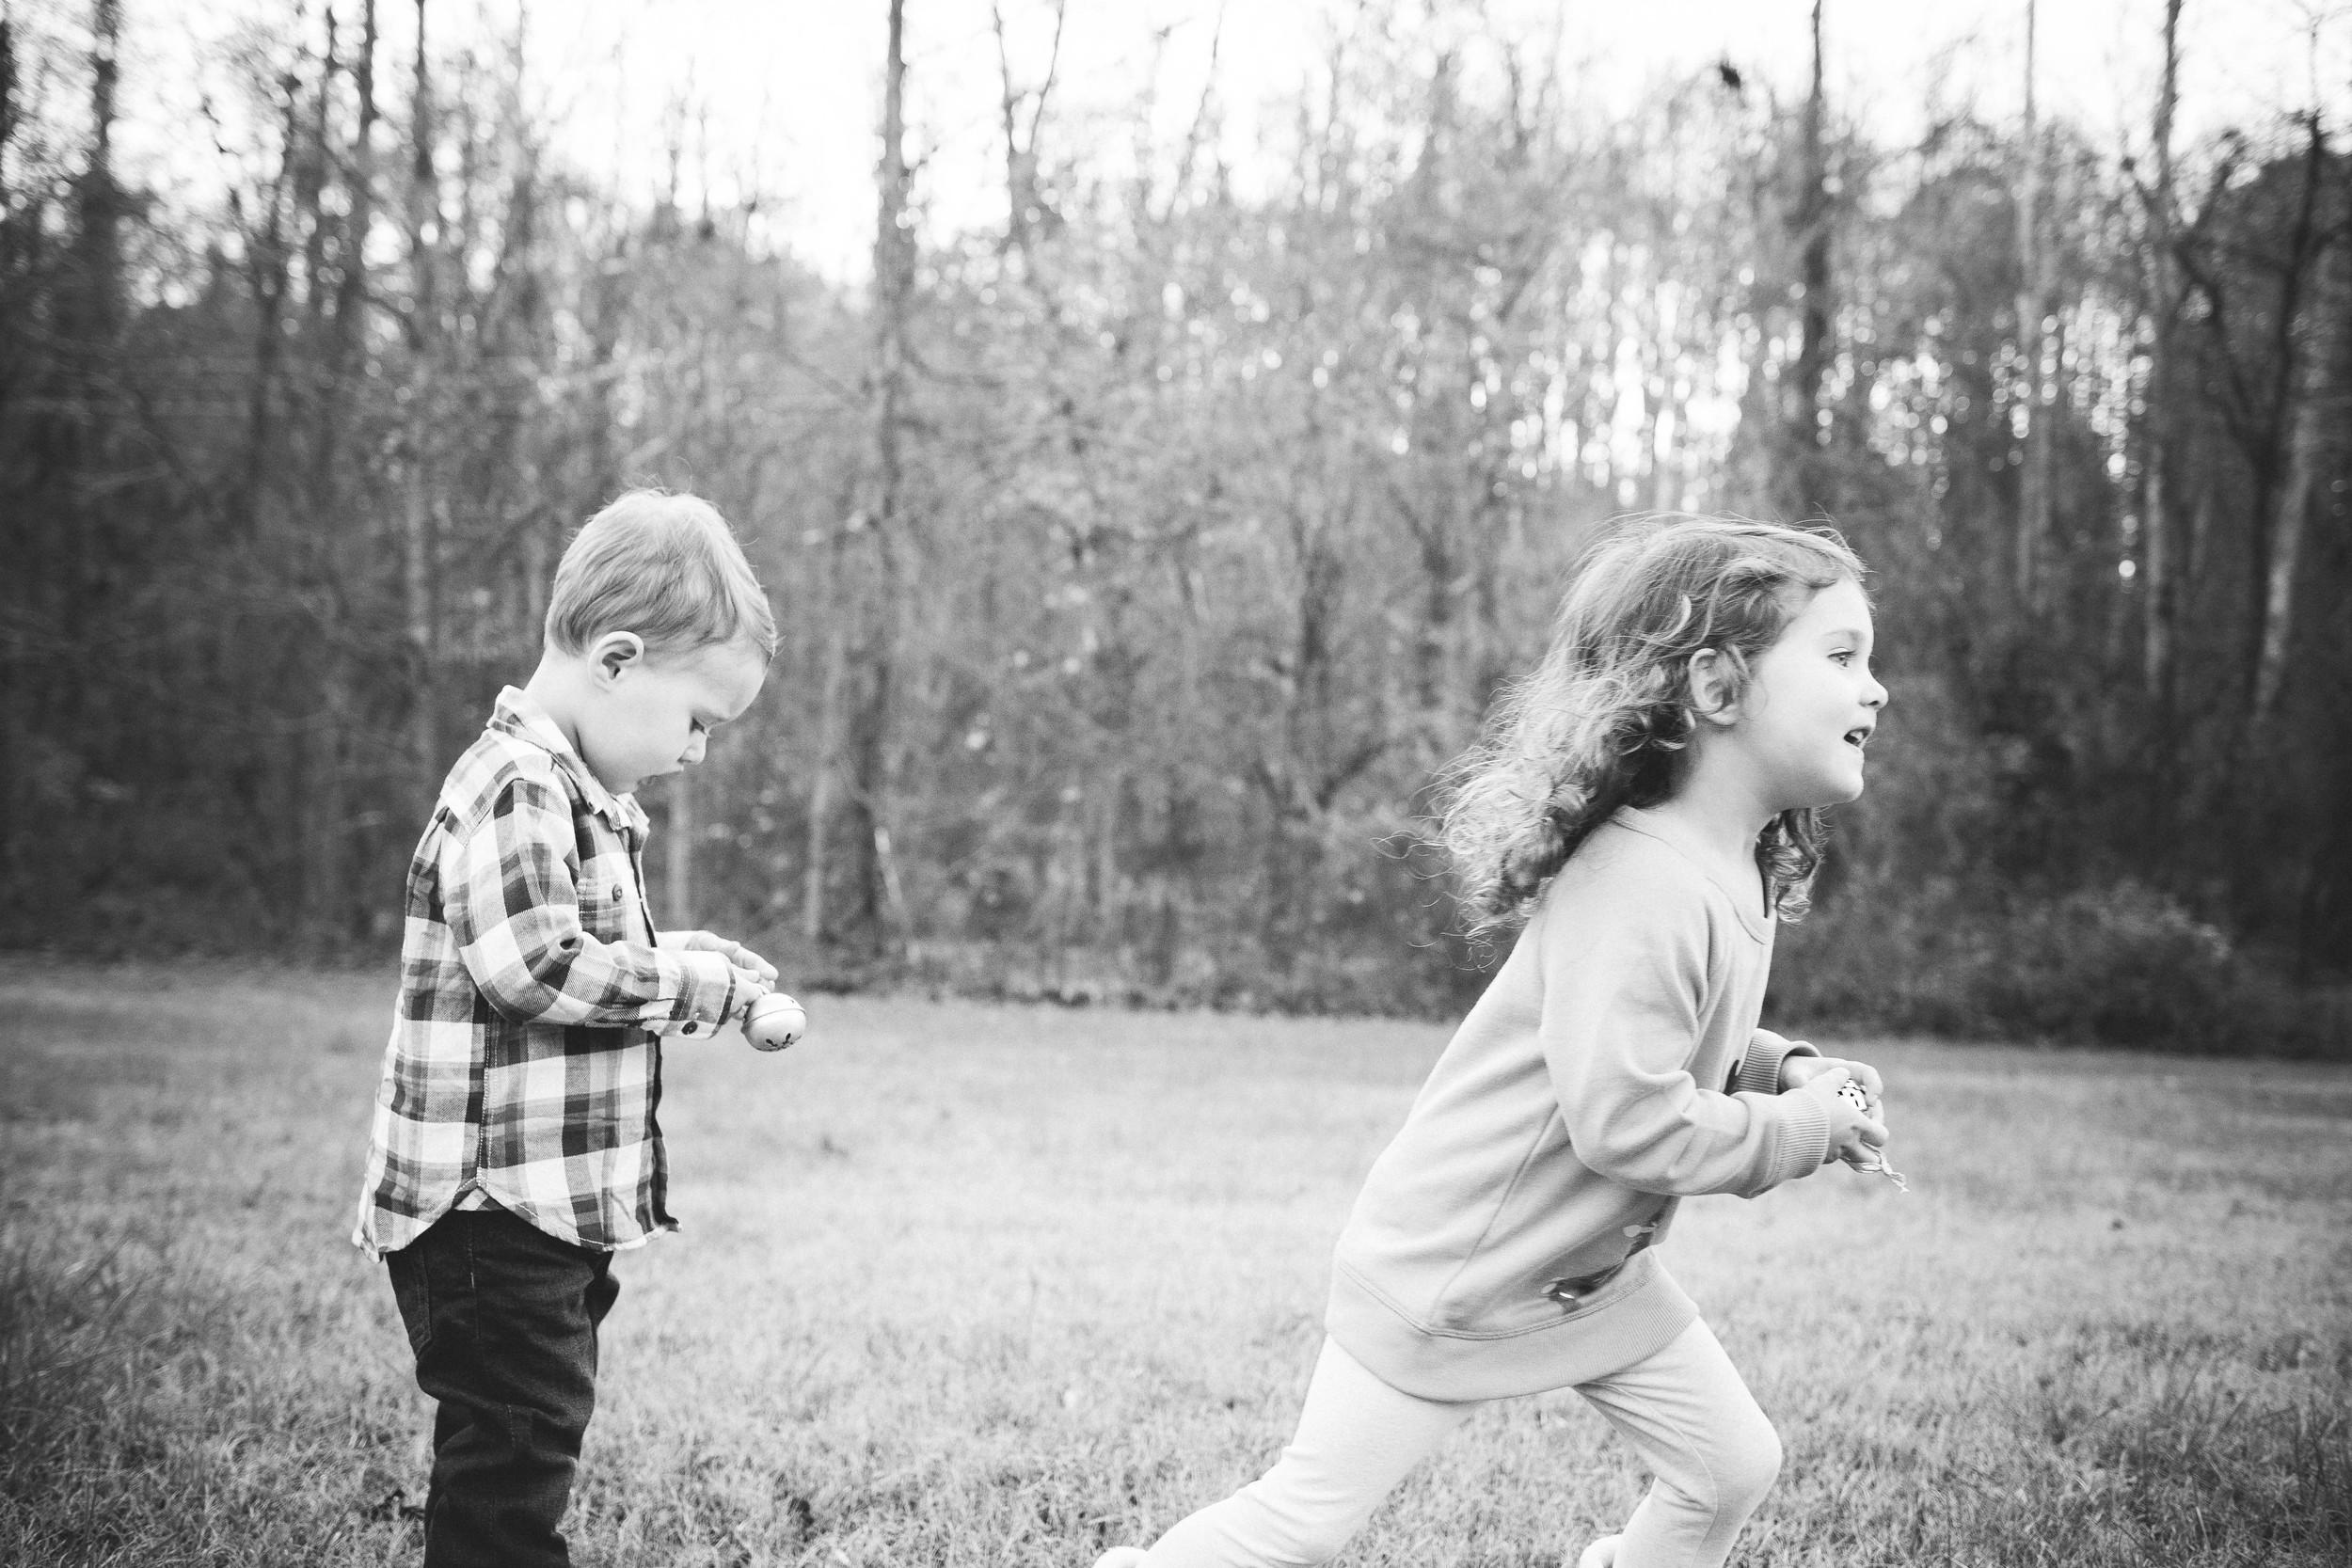 kids_playing_candid